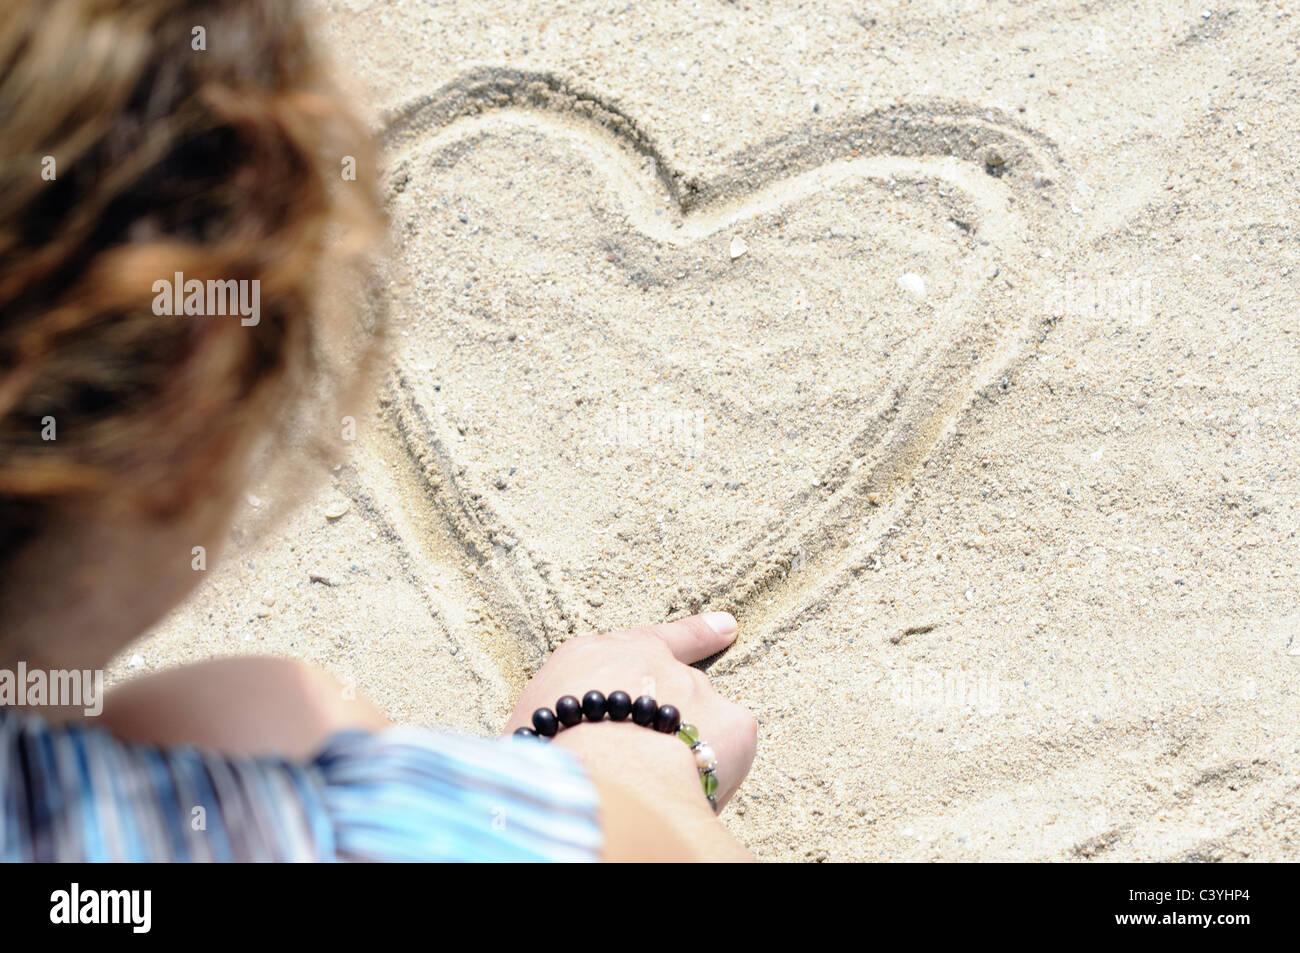 Flirt vacanza Immagini Stock